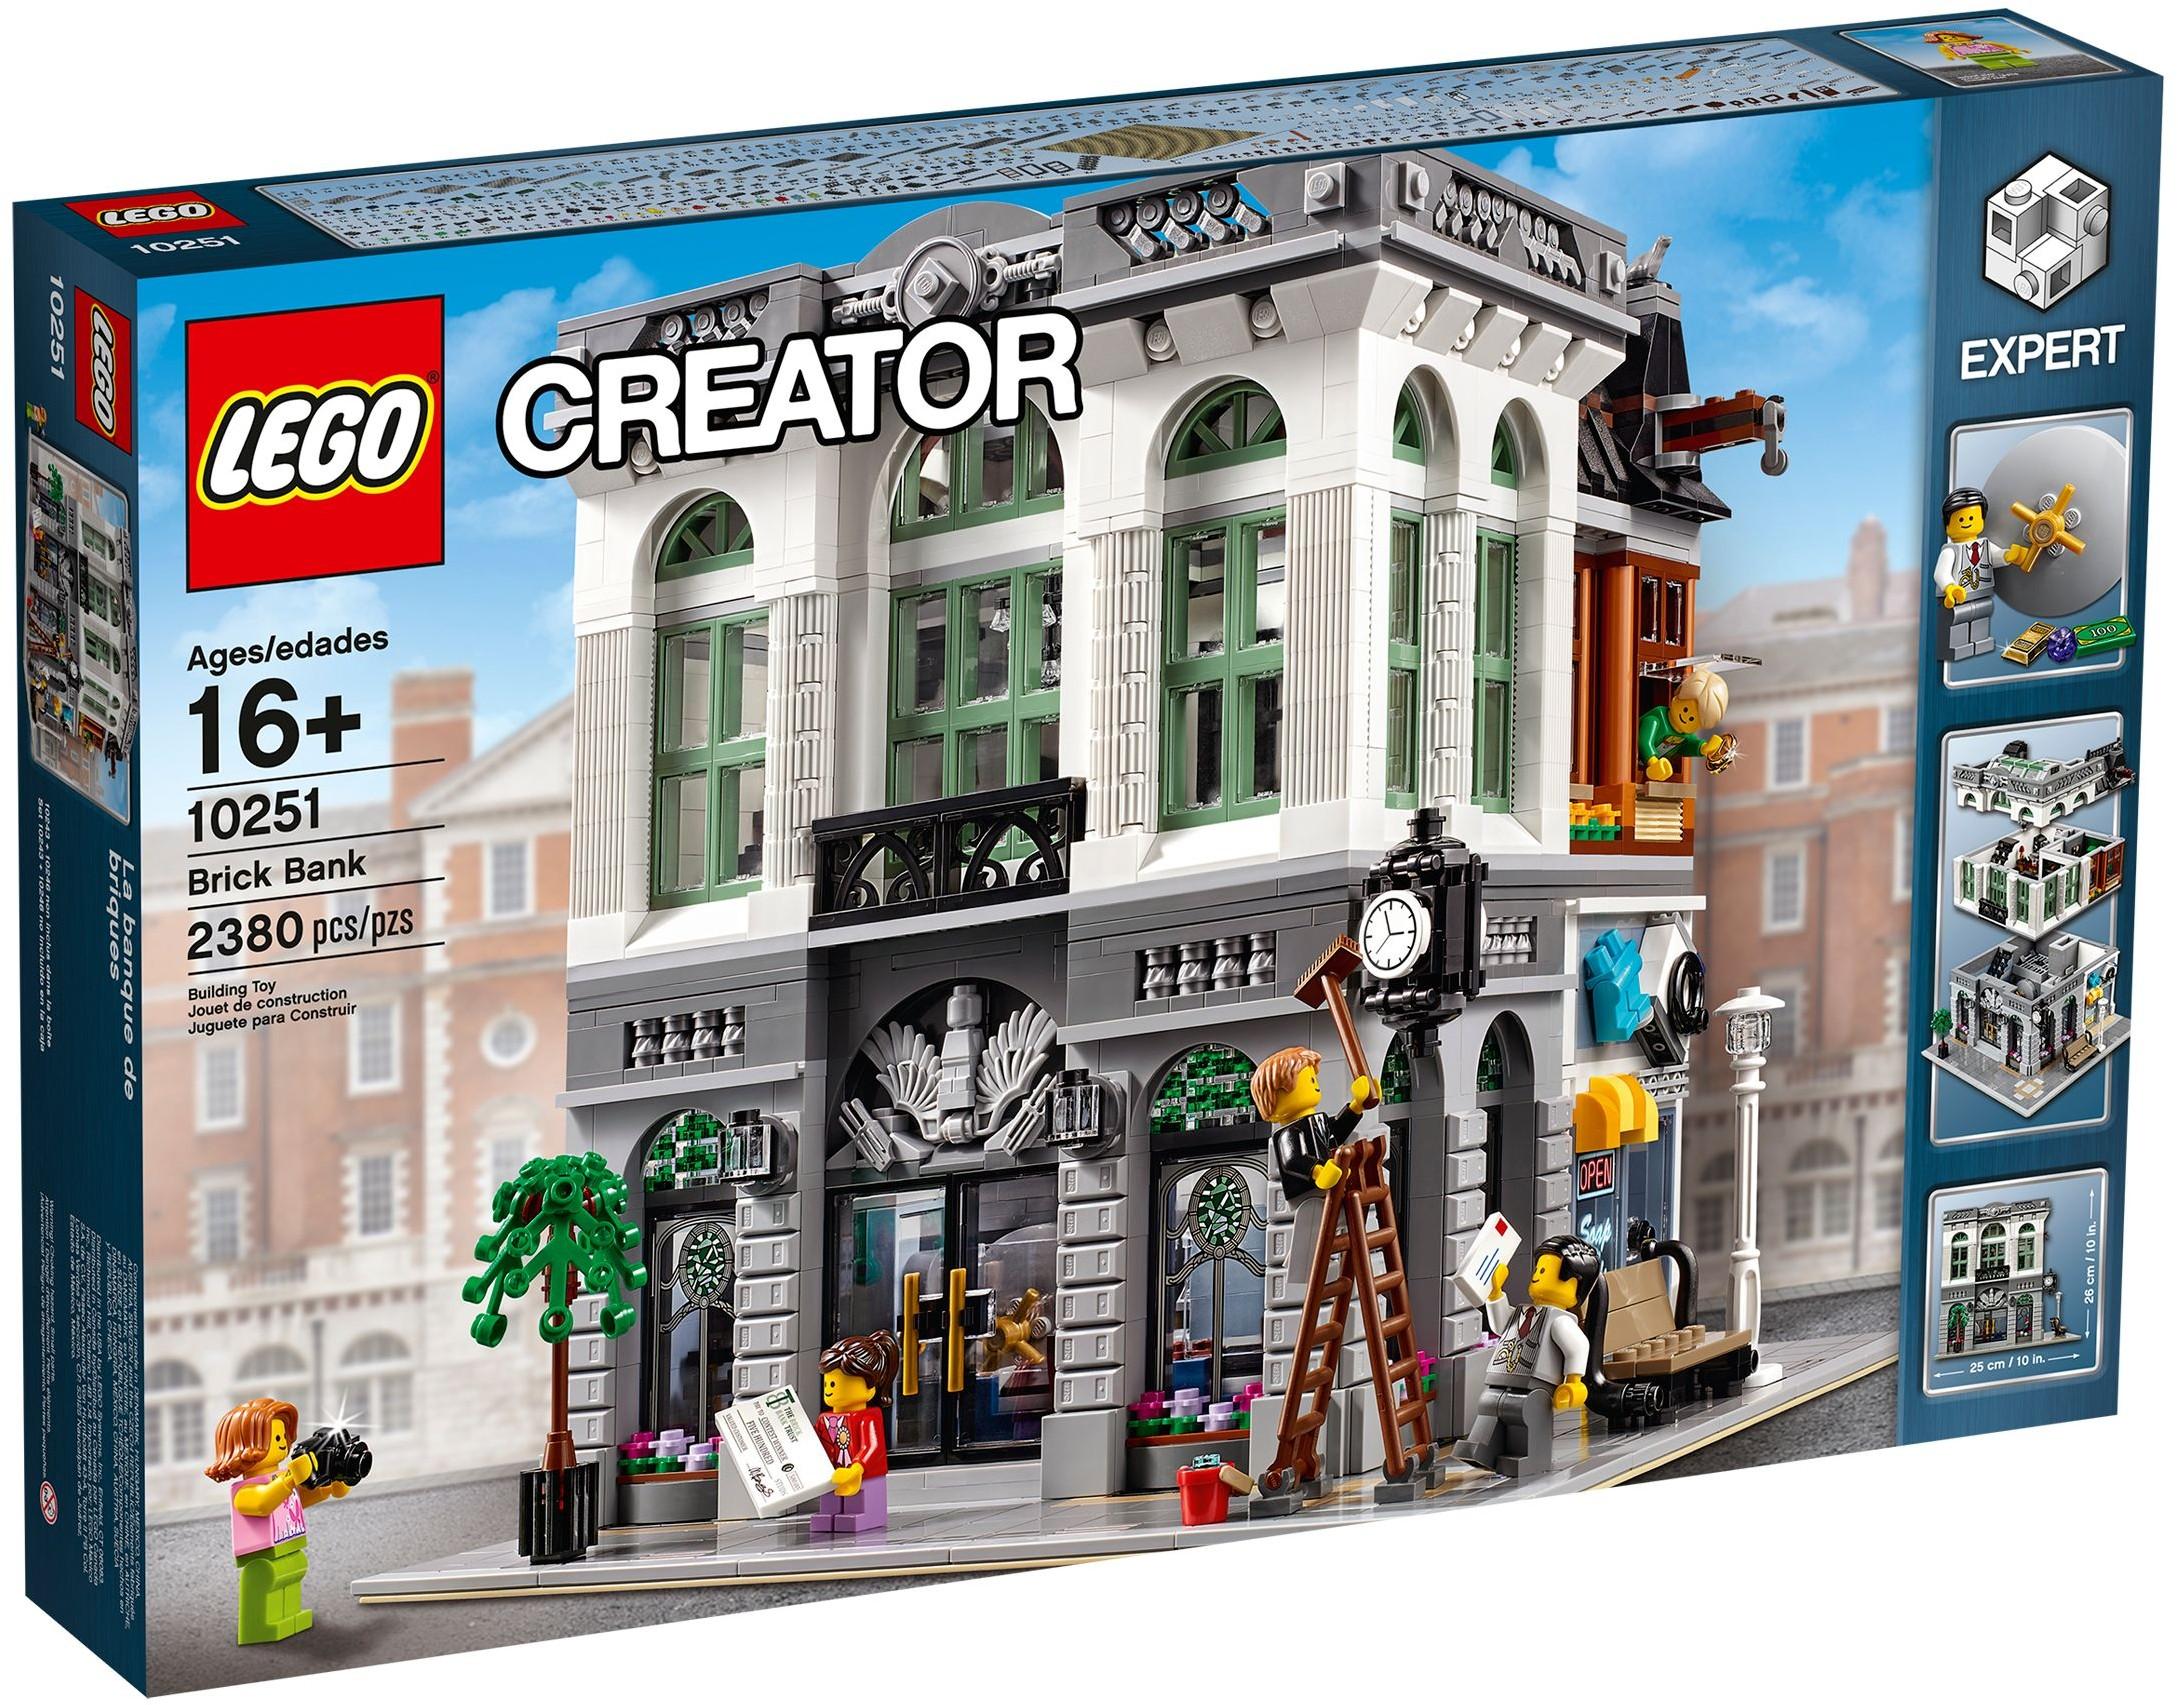 Lampada Lego Batman : Lego iconic geschäft im miniformat exlusive store figur